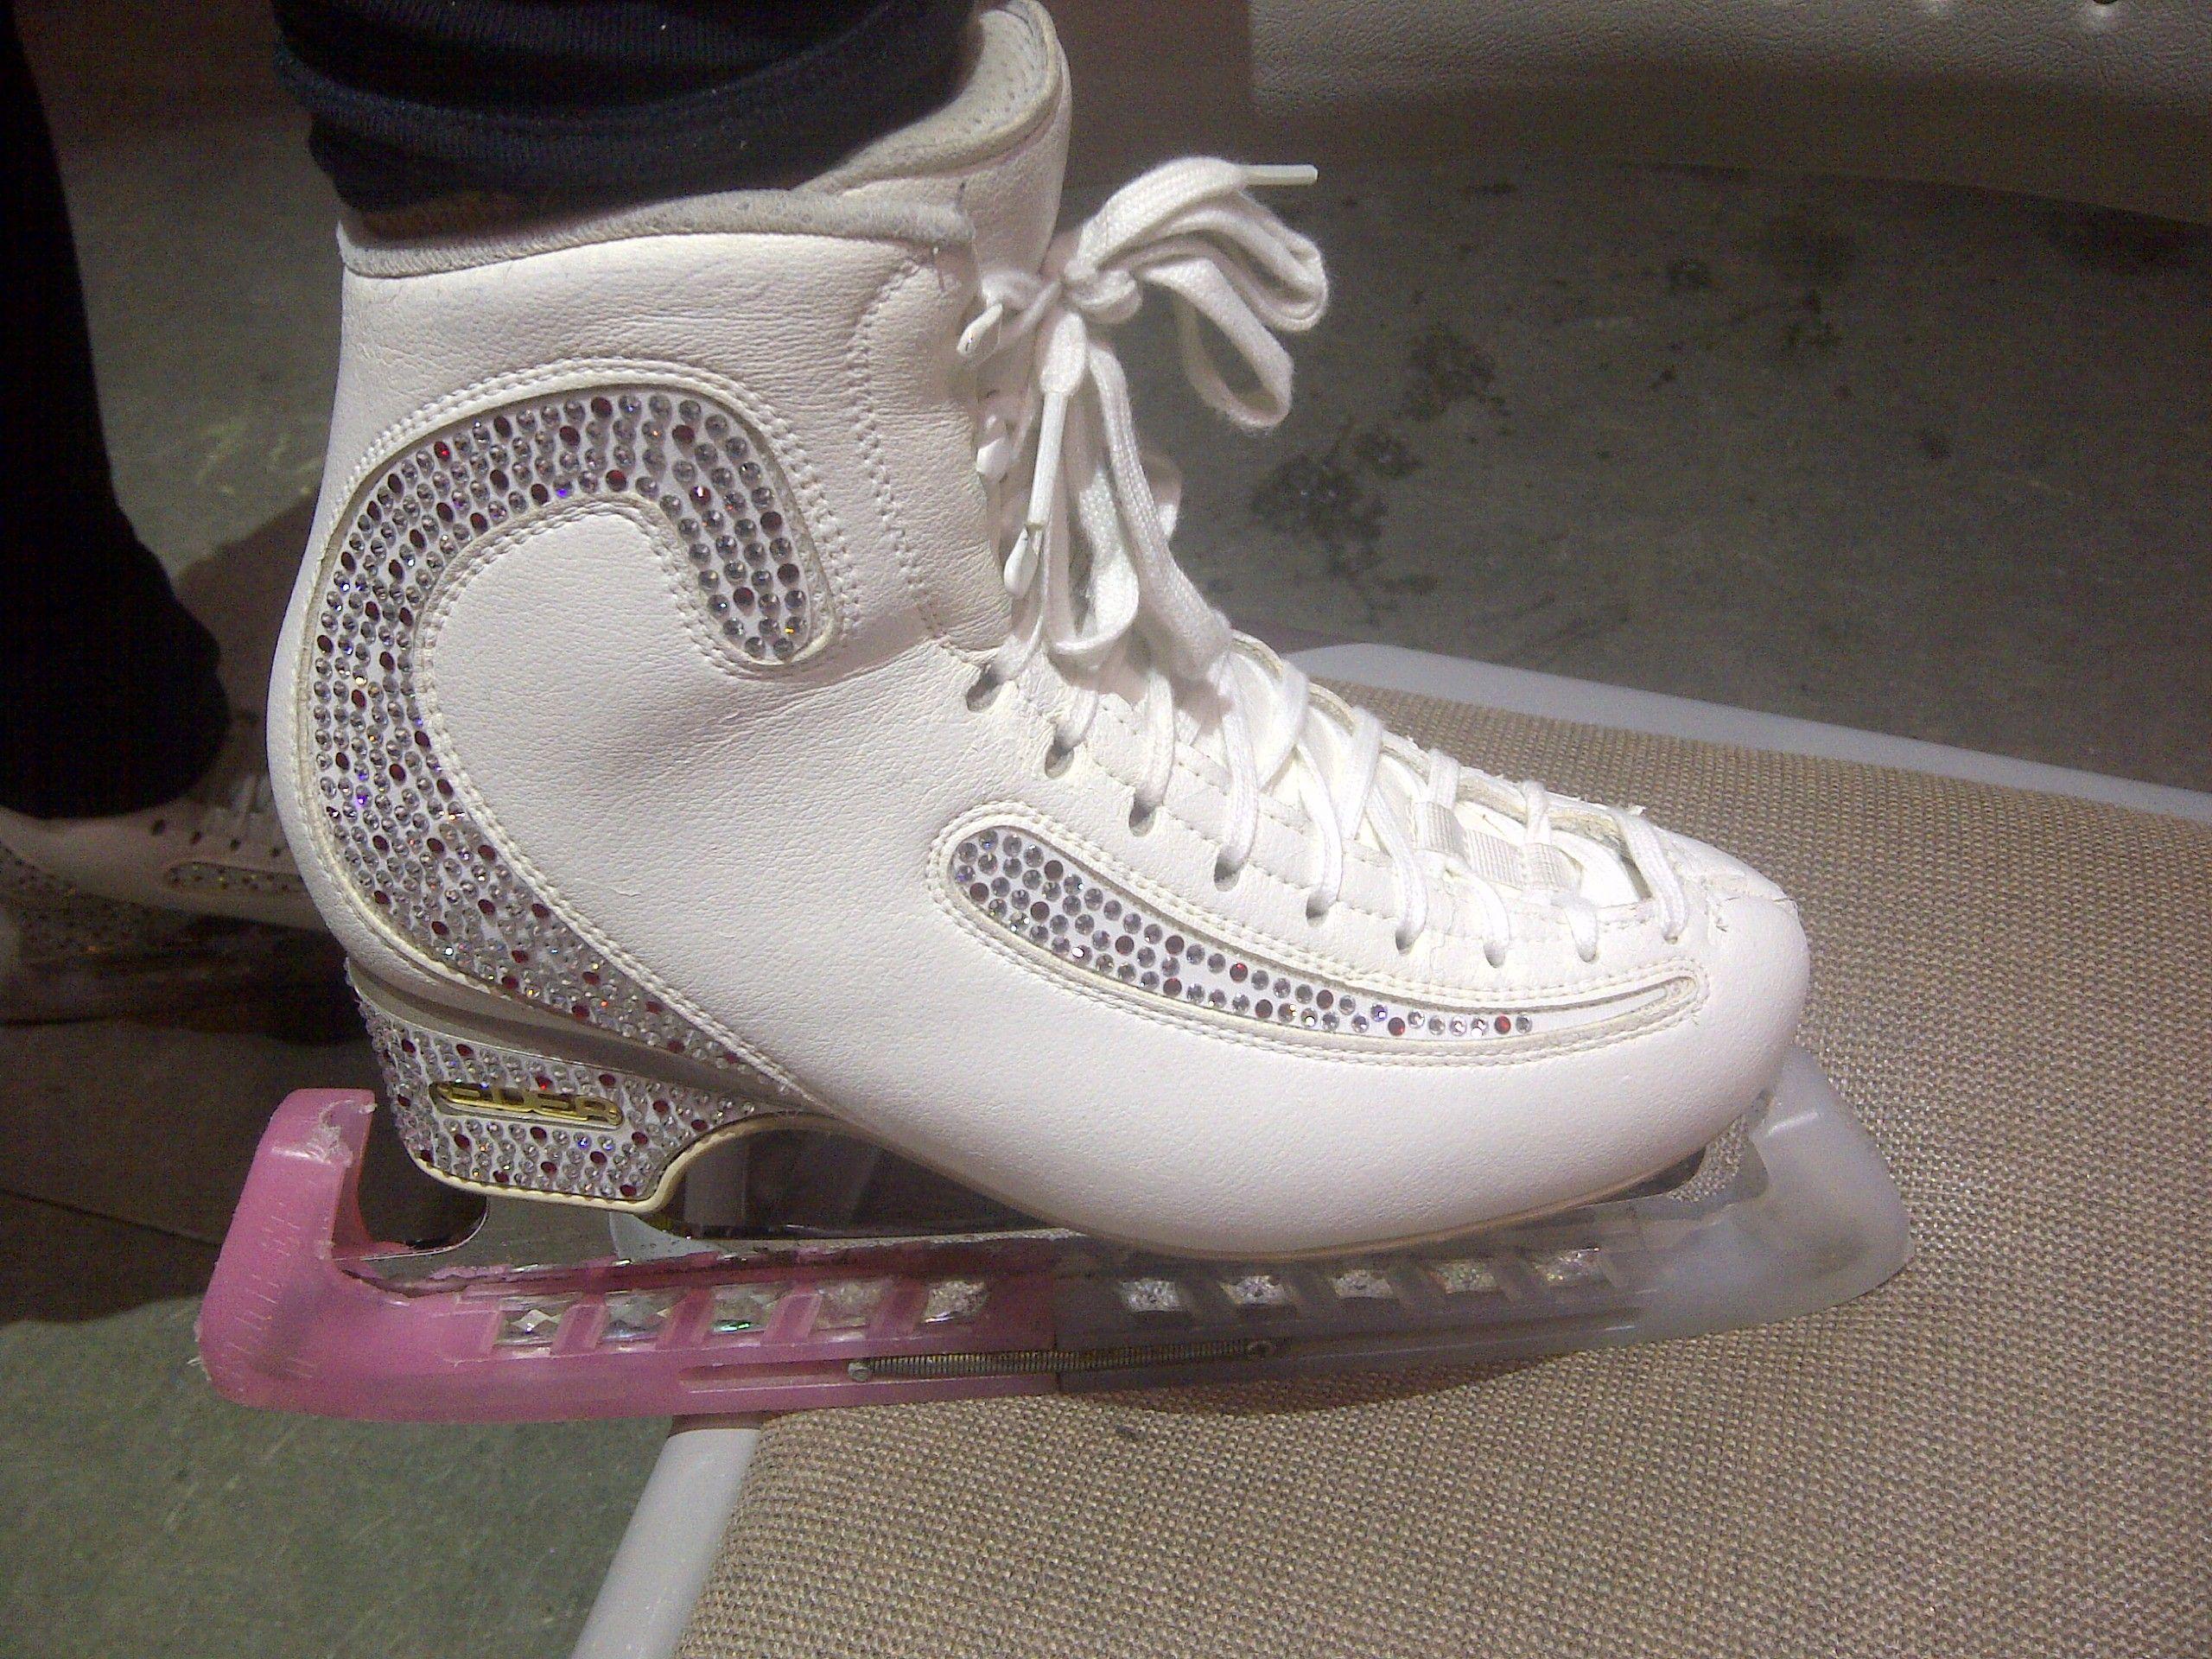 Crystals On Edea Skates Figure Skate Boots Skating Dresses Skate